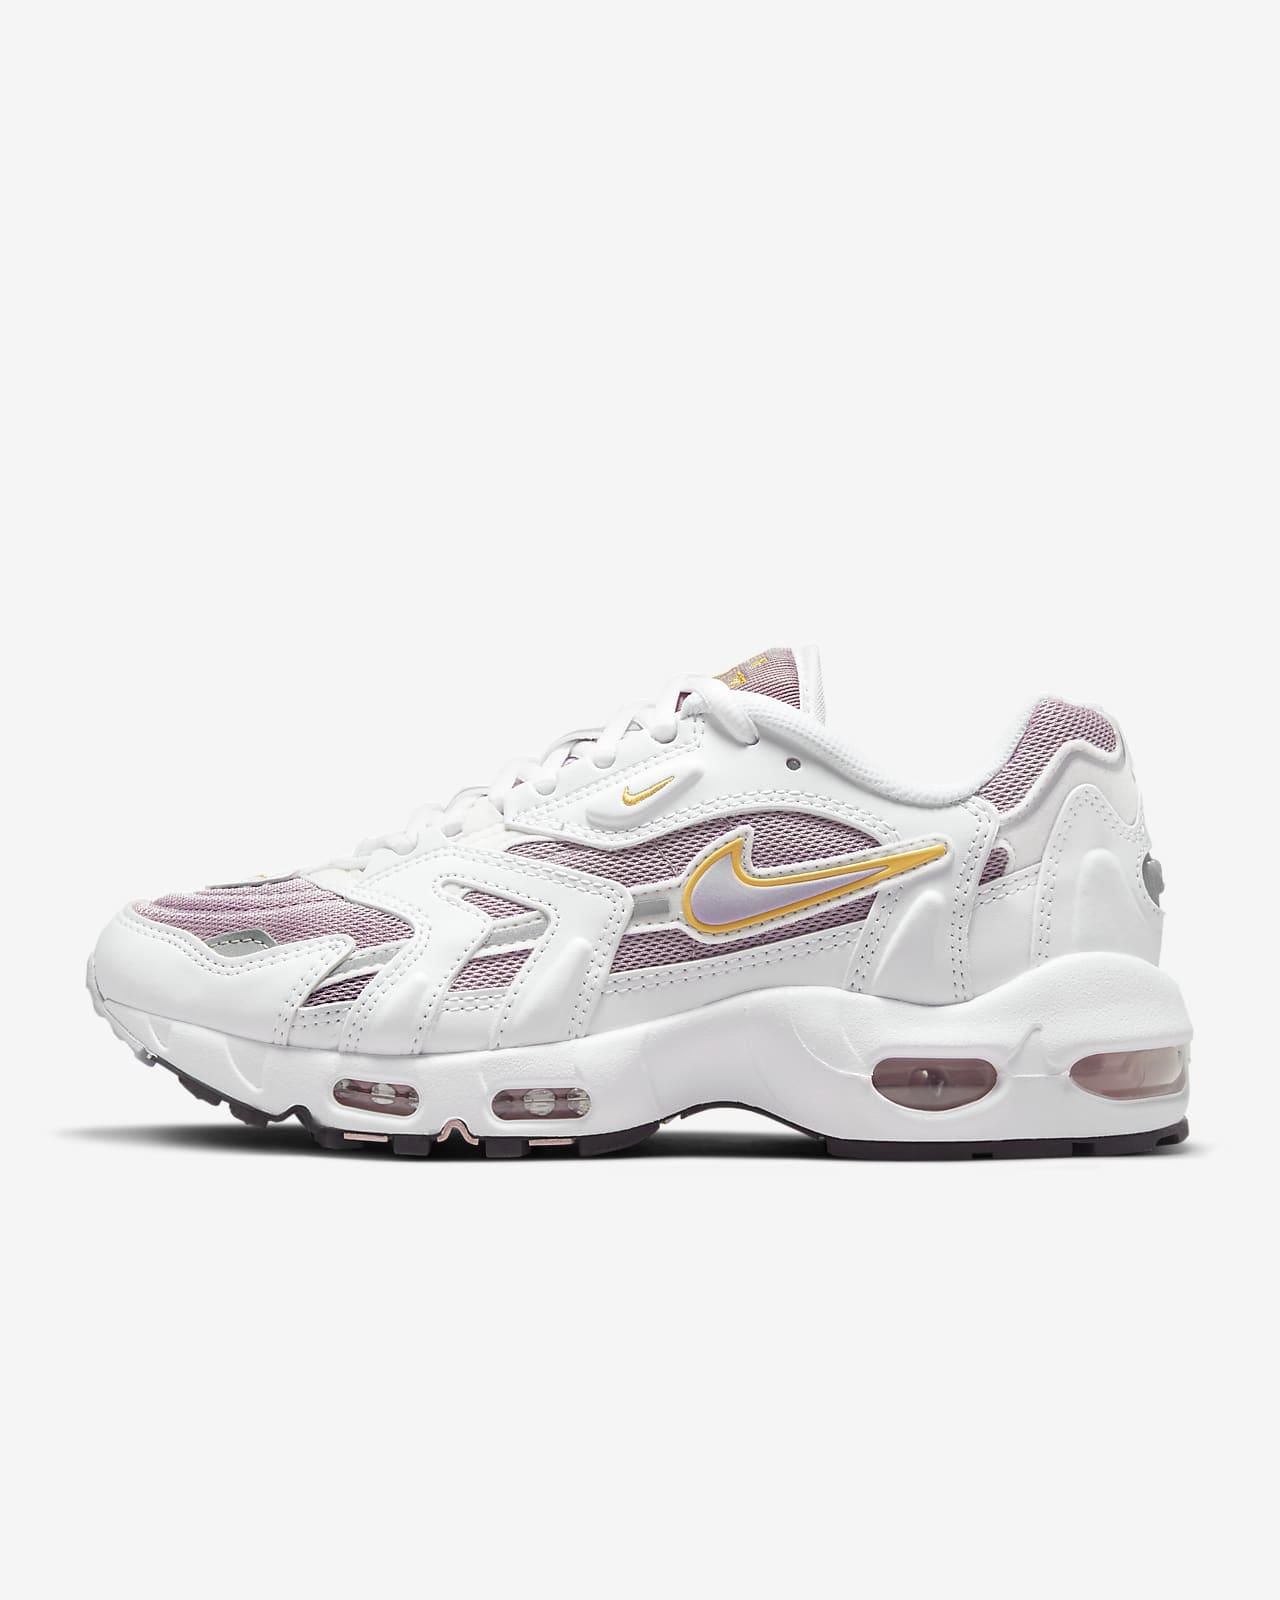 Chaussures Nike Air Max 96 2 pour Femme